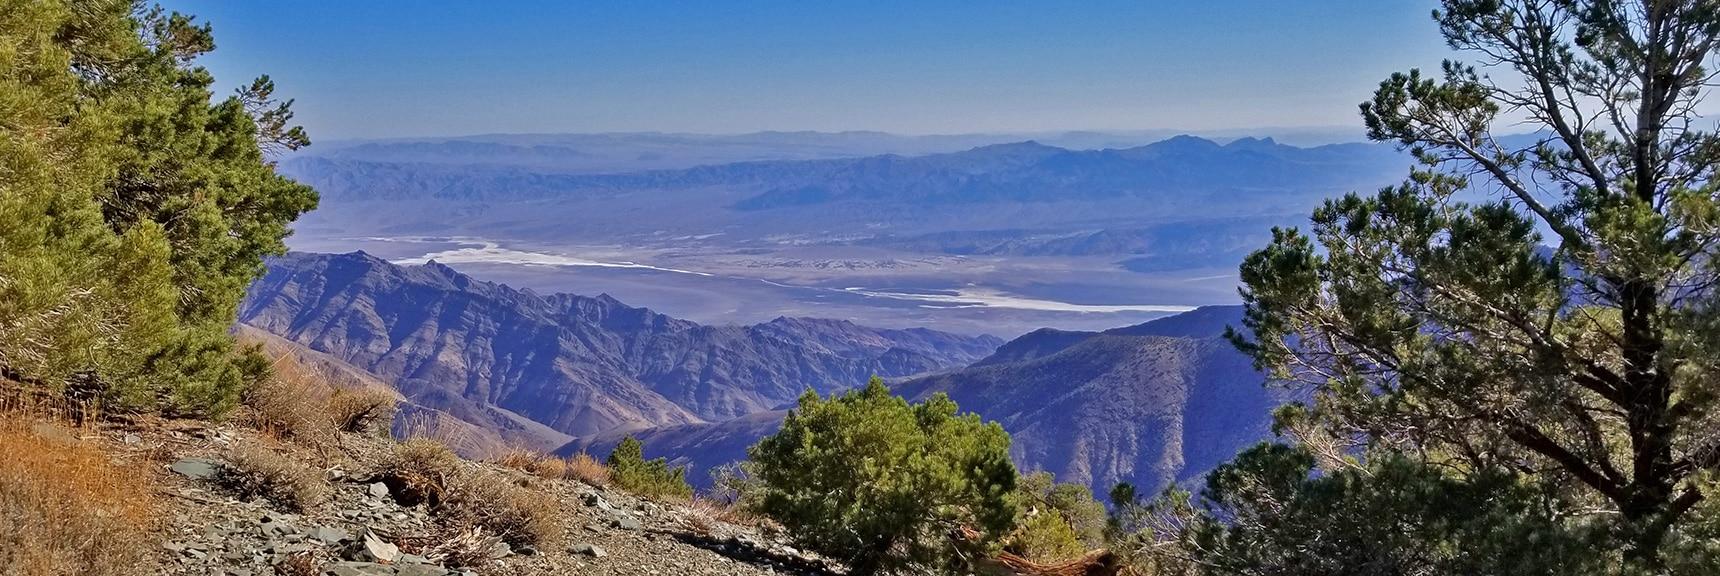 Death Valley, Furnace Creek Area, Viewed from Wildrose Peak Final Summit Approach   Wildrose Peak   Panamint Mountain Range   Death Valley National Park, California